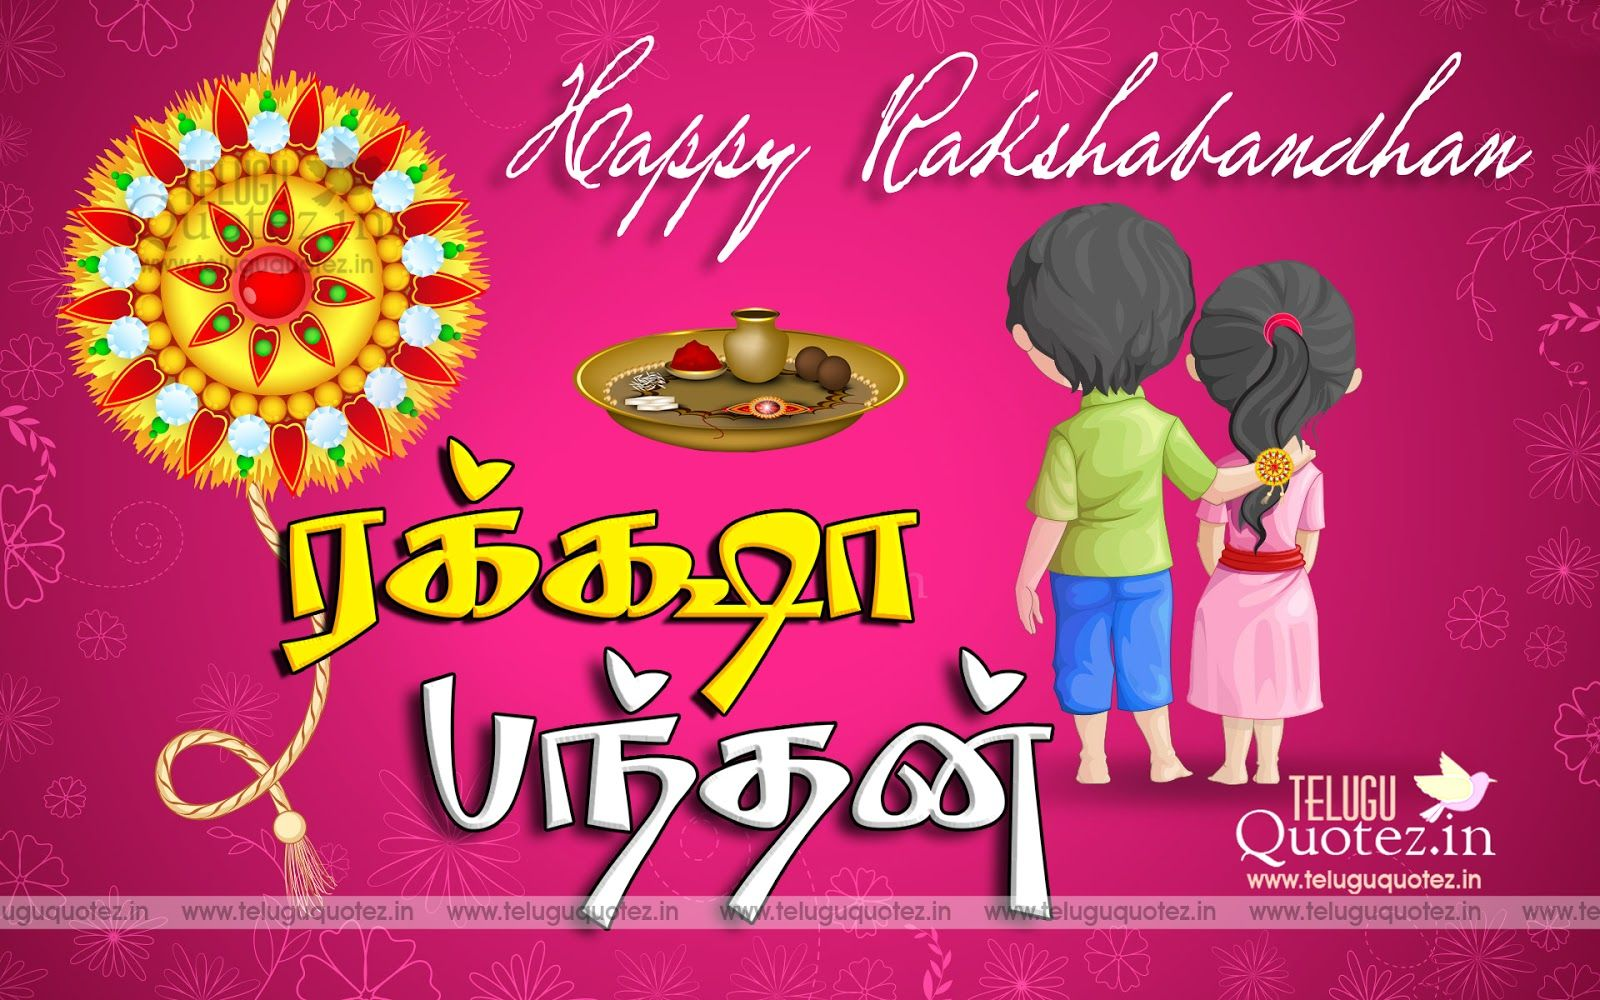 Happy raksha bandhan tamil quotes wishes greetings teluguquotez happy raksha bandhan tamil quotes wishes greetings teluguquotez kristyandbryce Image collections